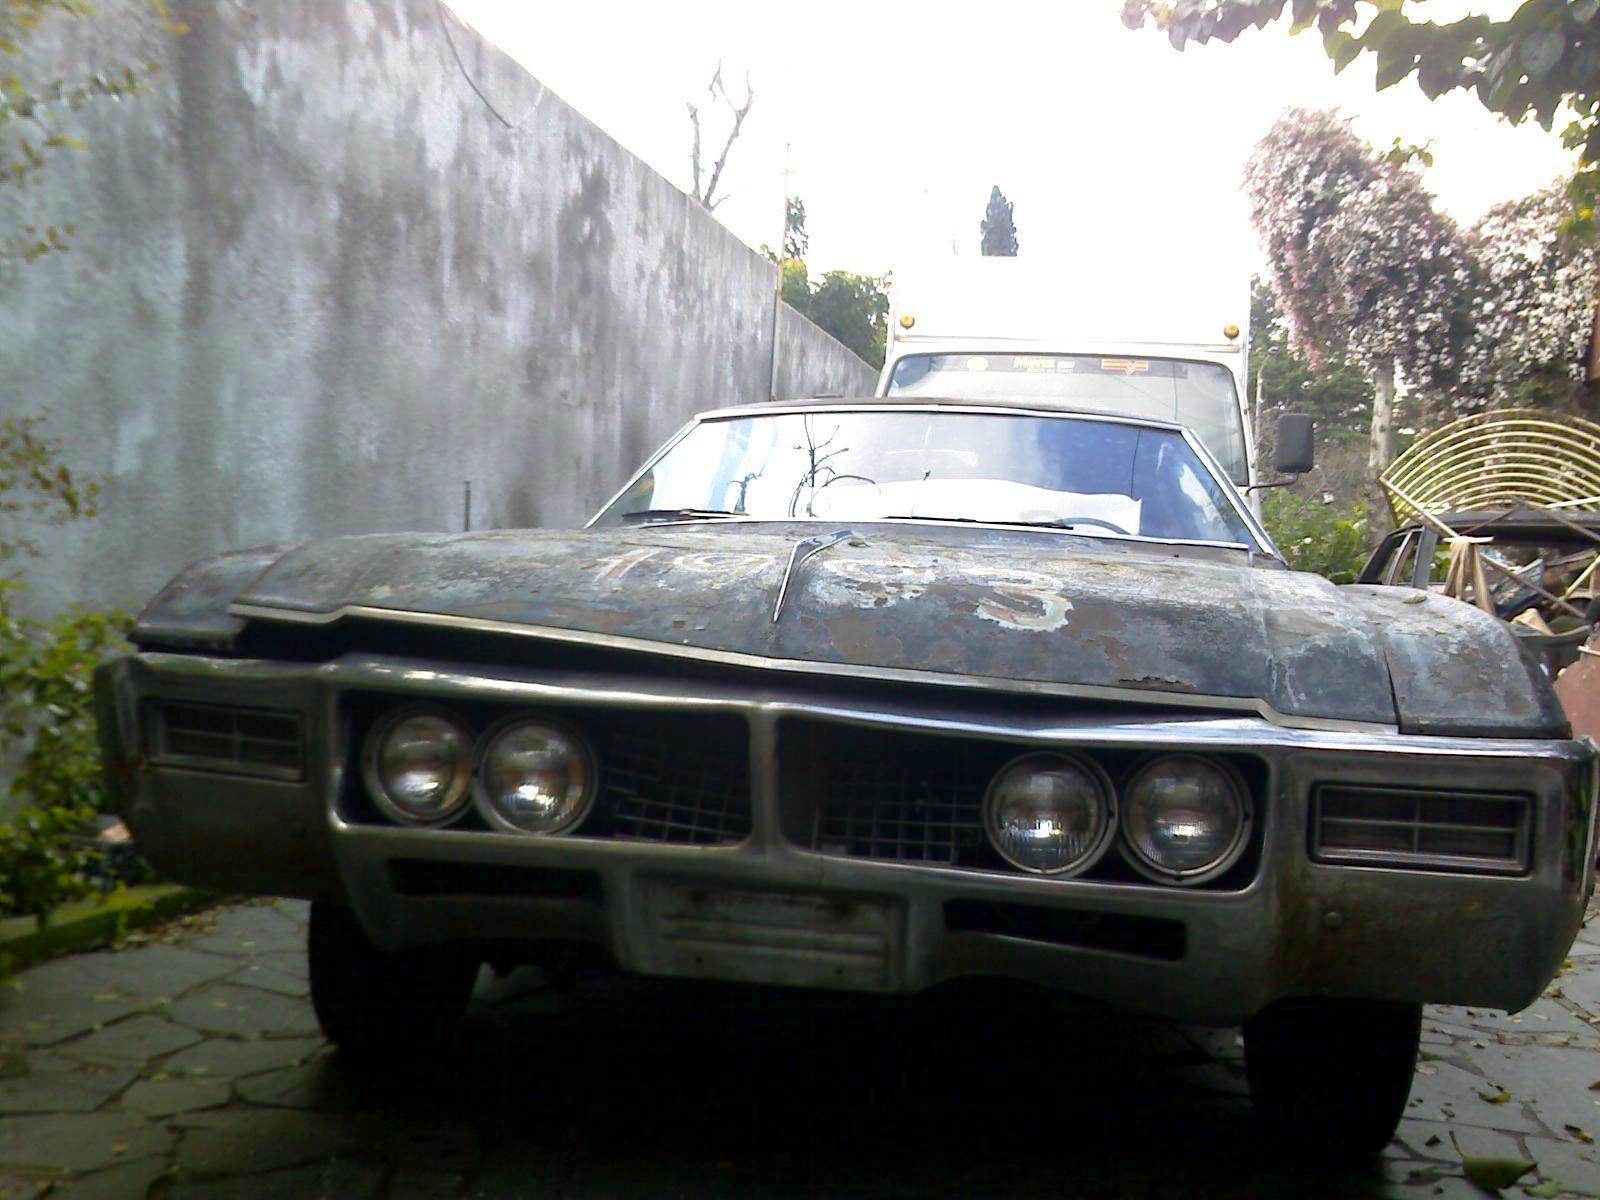 19-09-09_1425 Buick Riviera (1969)